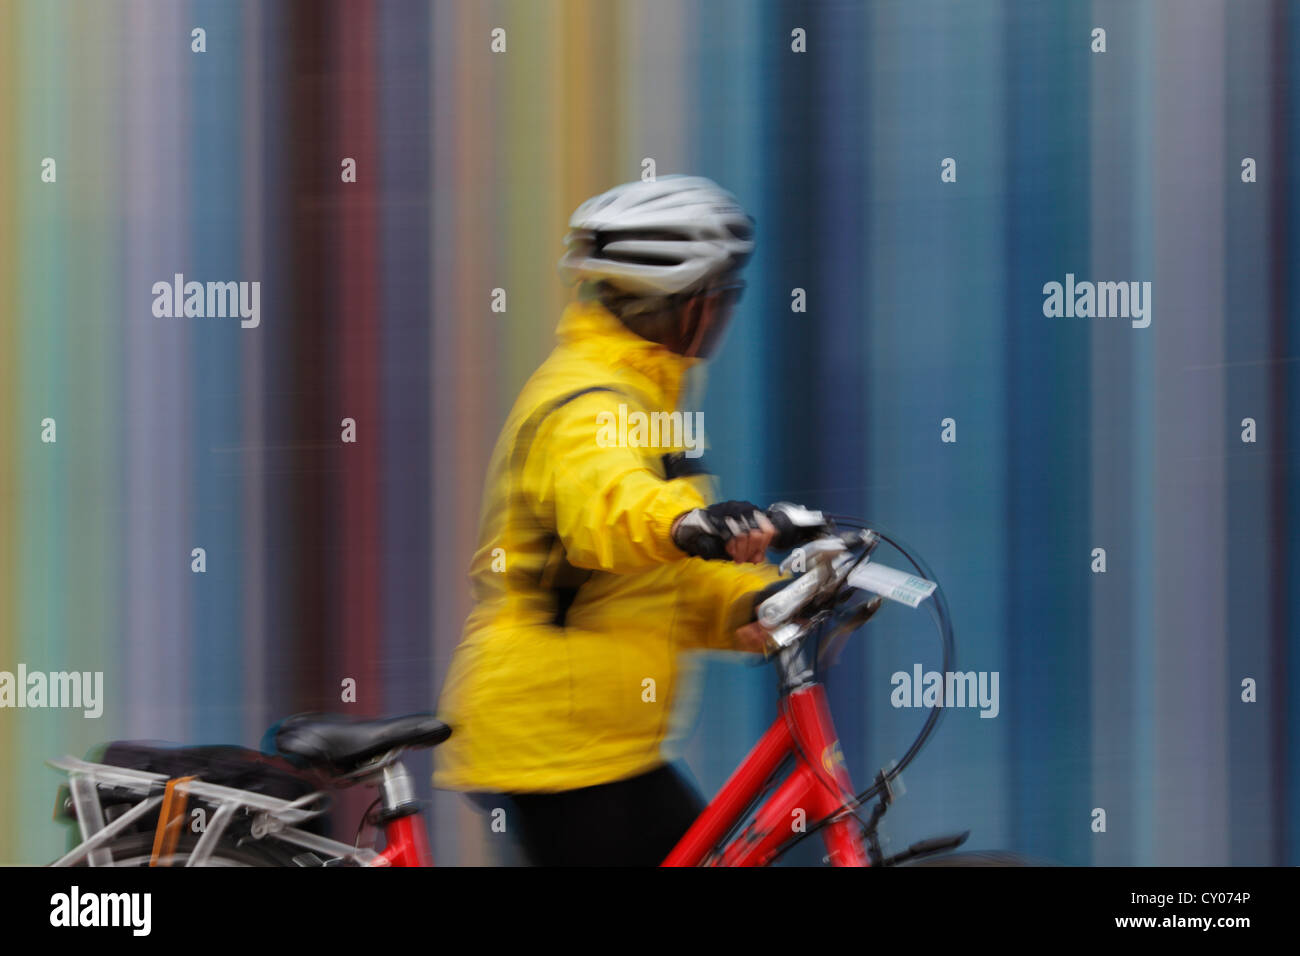 A female tourist with bike passing the Tour Moretti at the Esplanade du General de Gaulle in La Defense, Paris - Stock Image